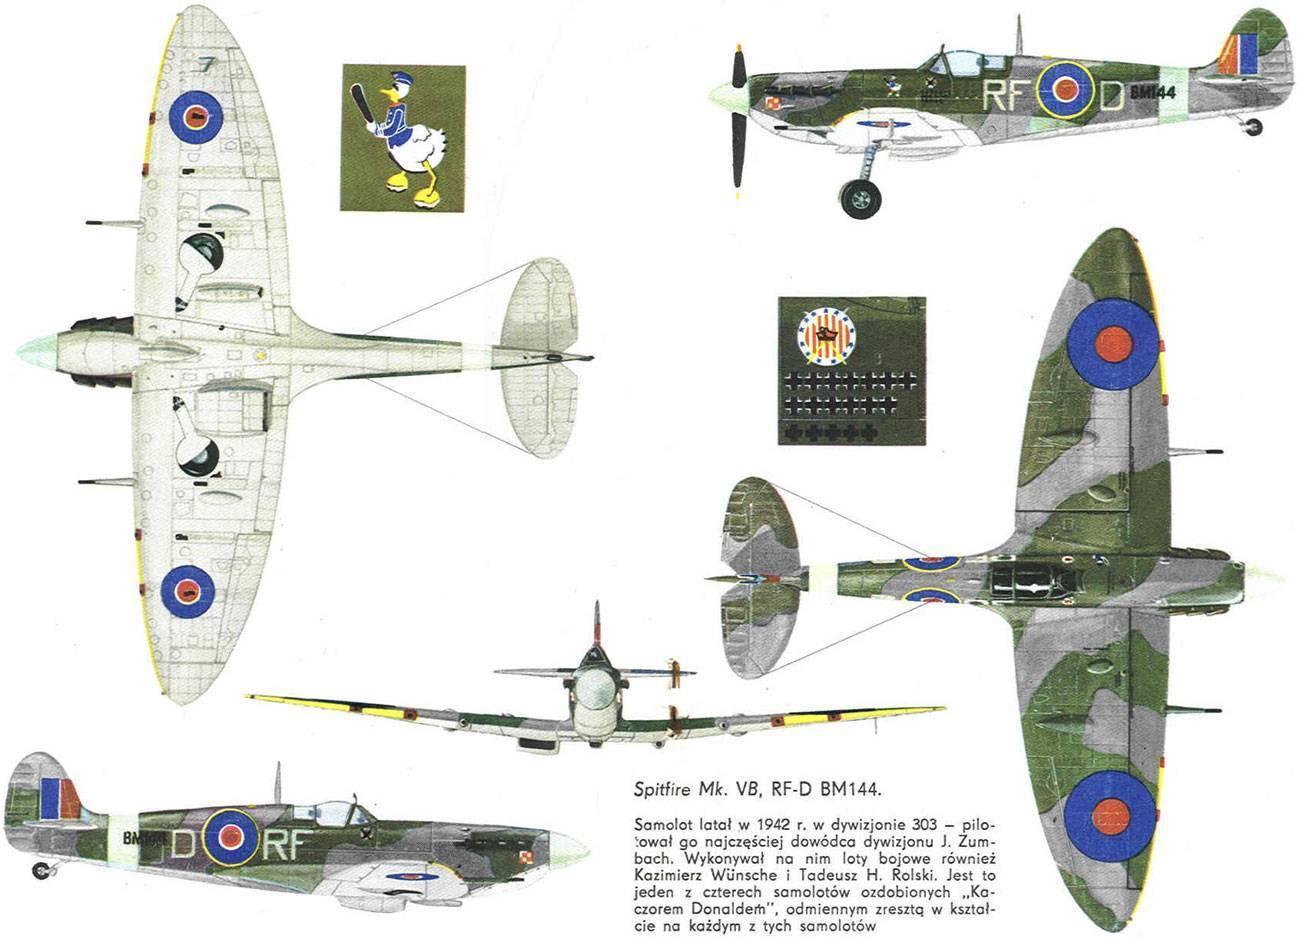 Spitfire f mk xvi